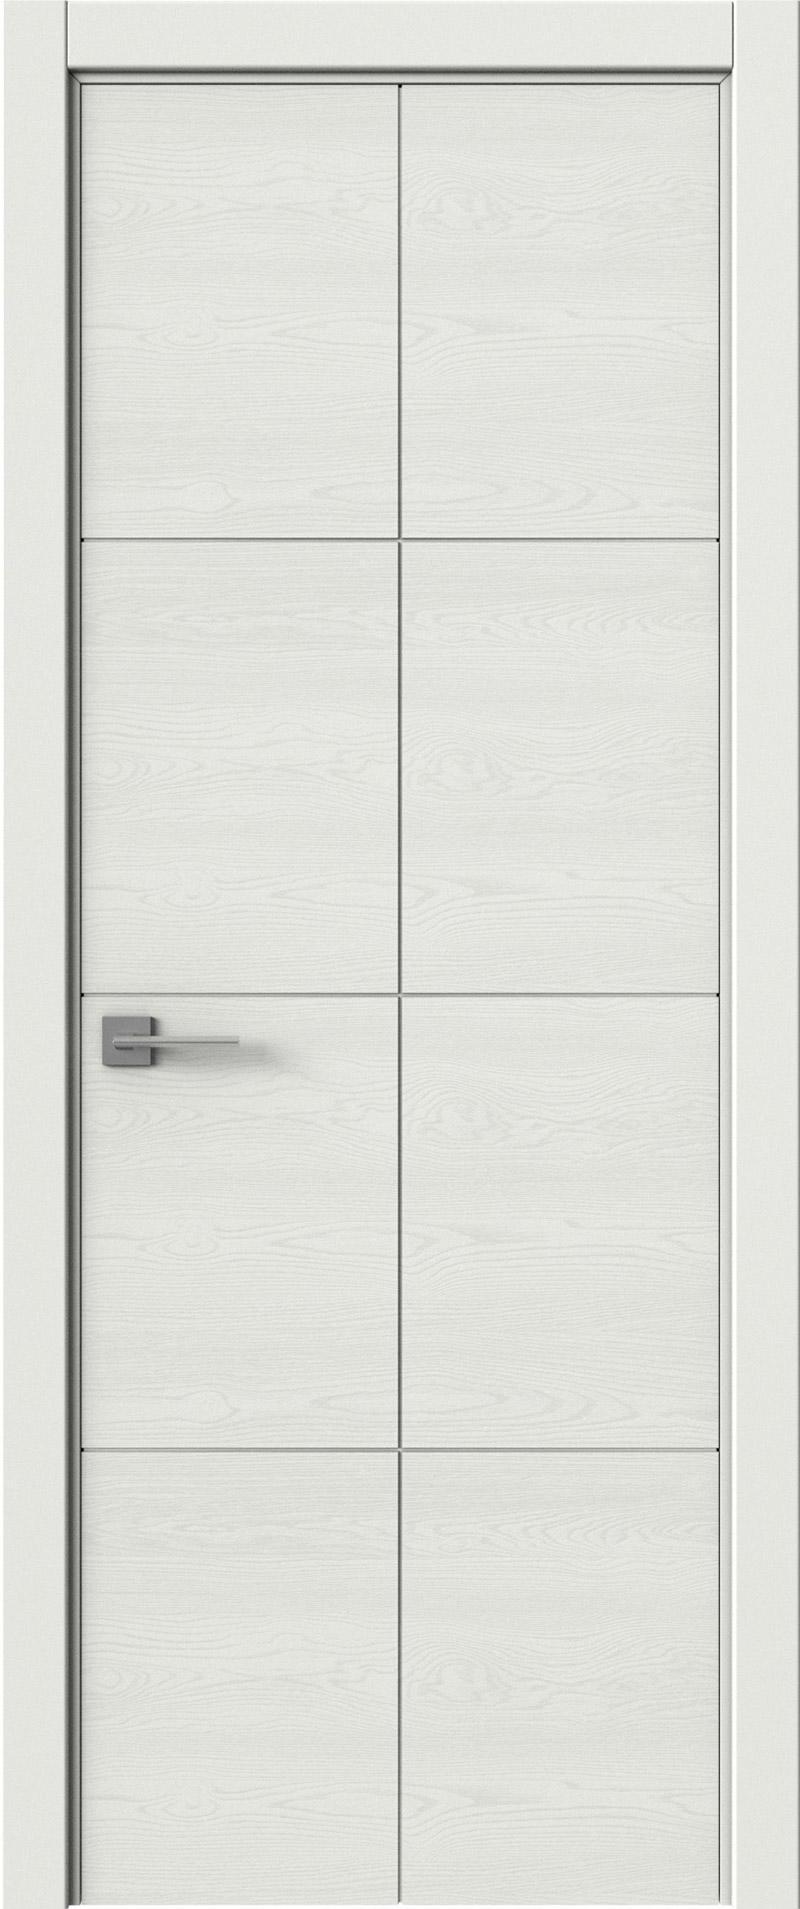 Tivoli Л-2 цвет - Белая эмаль по шпону (RAL 9003) Без стекла (ДГ)